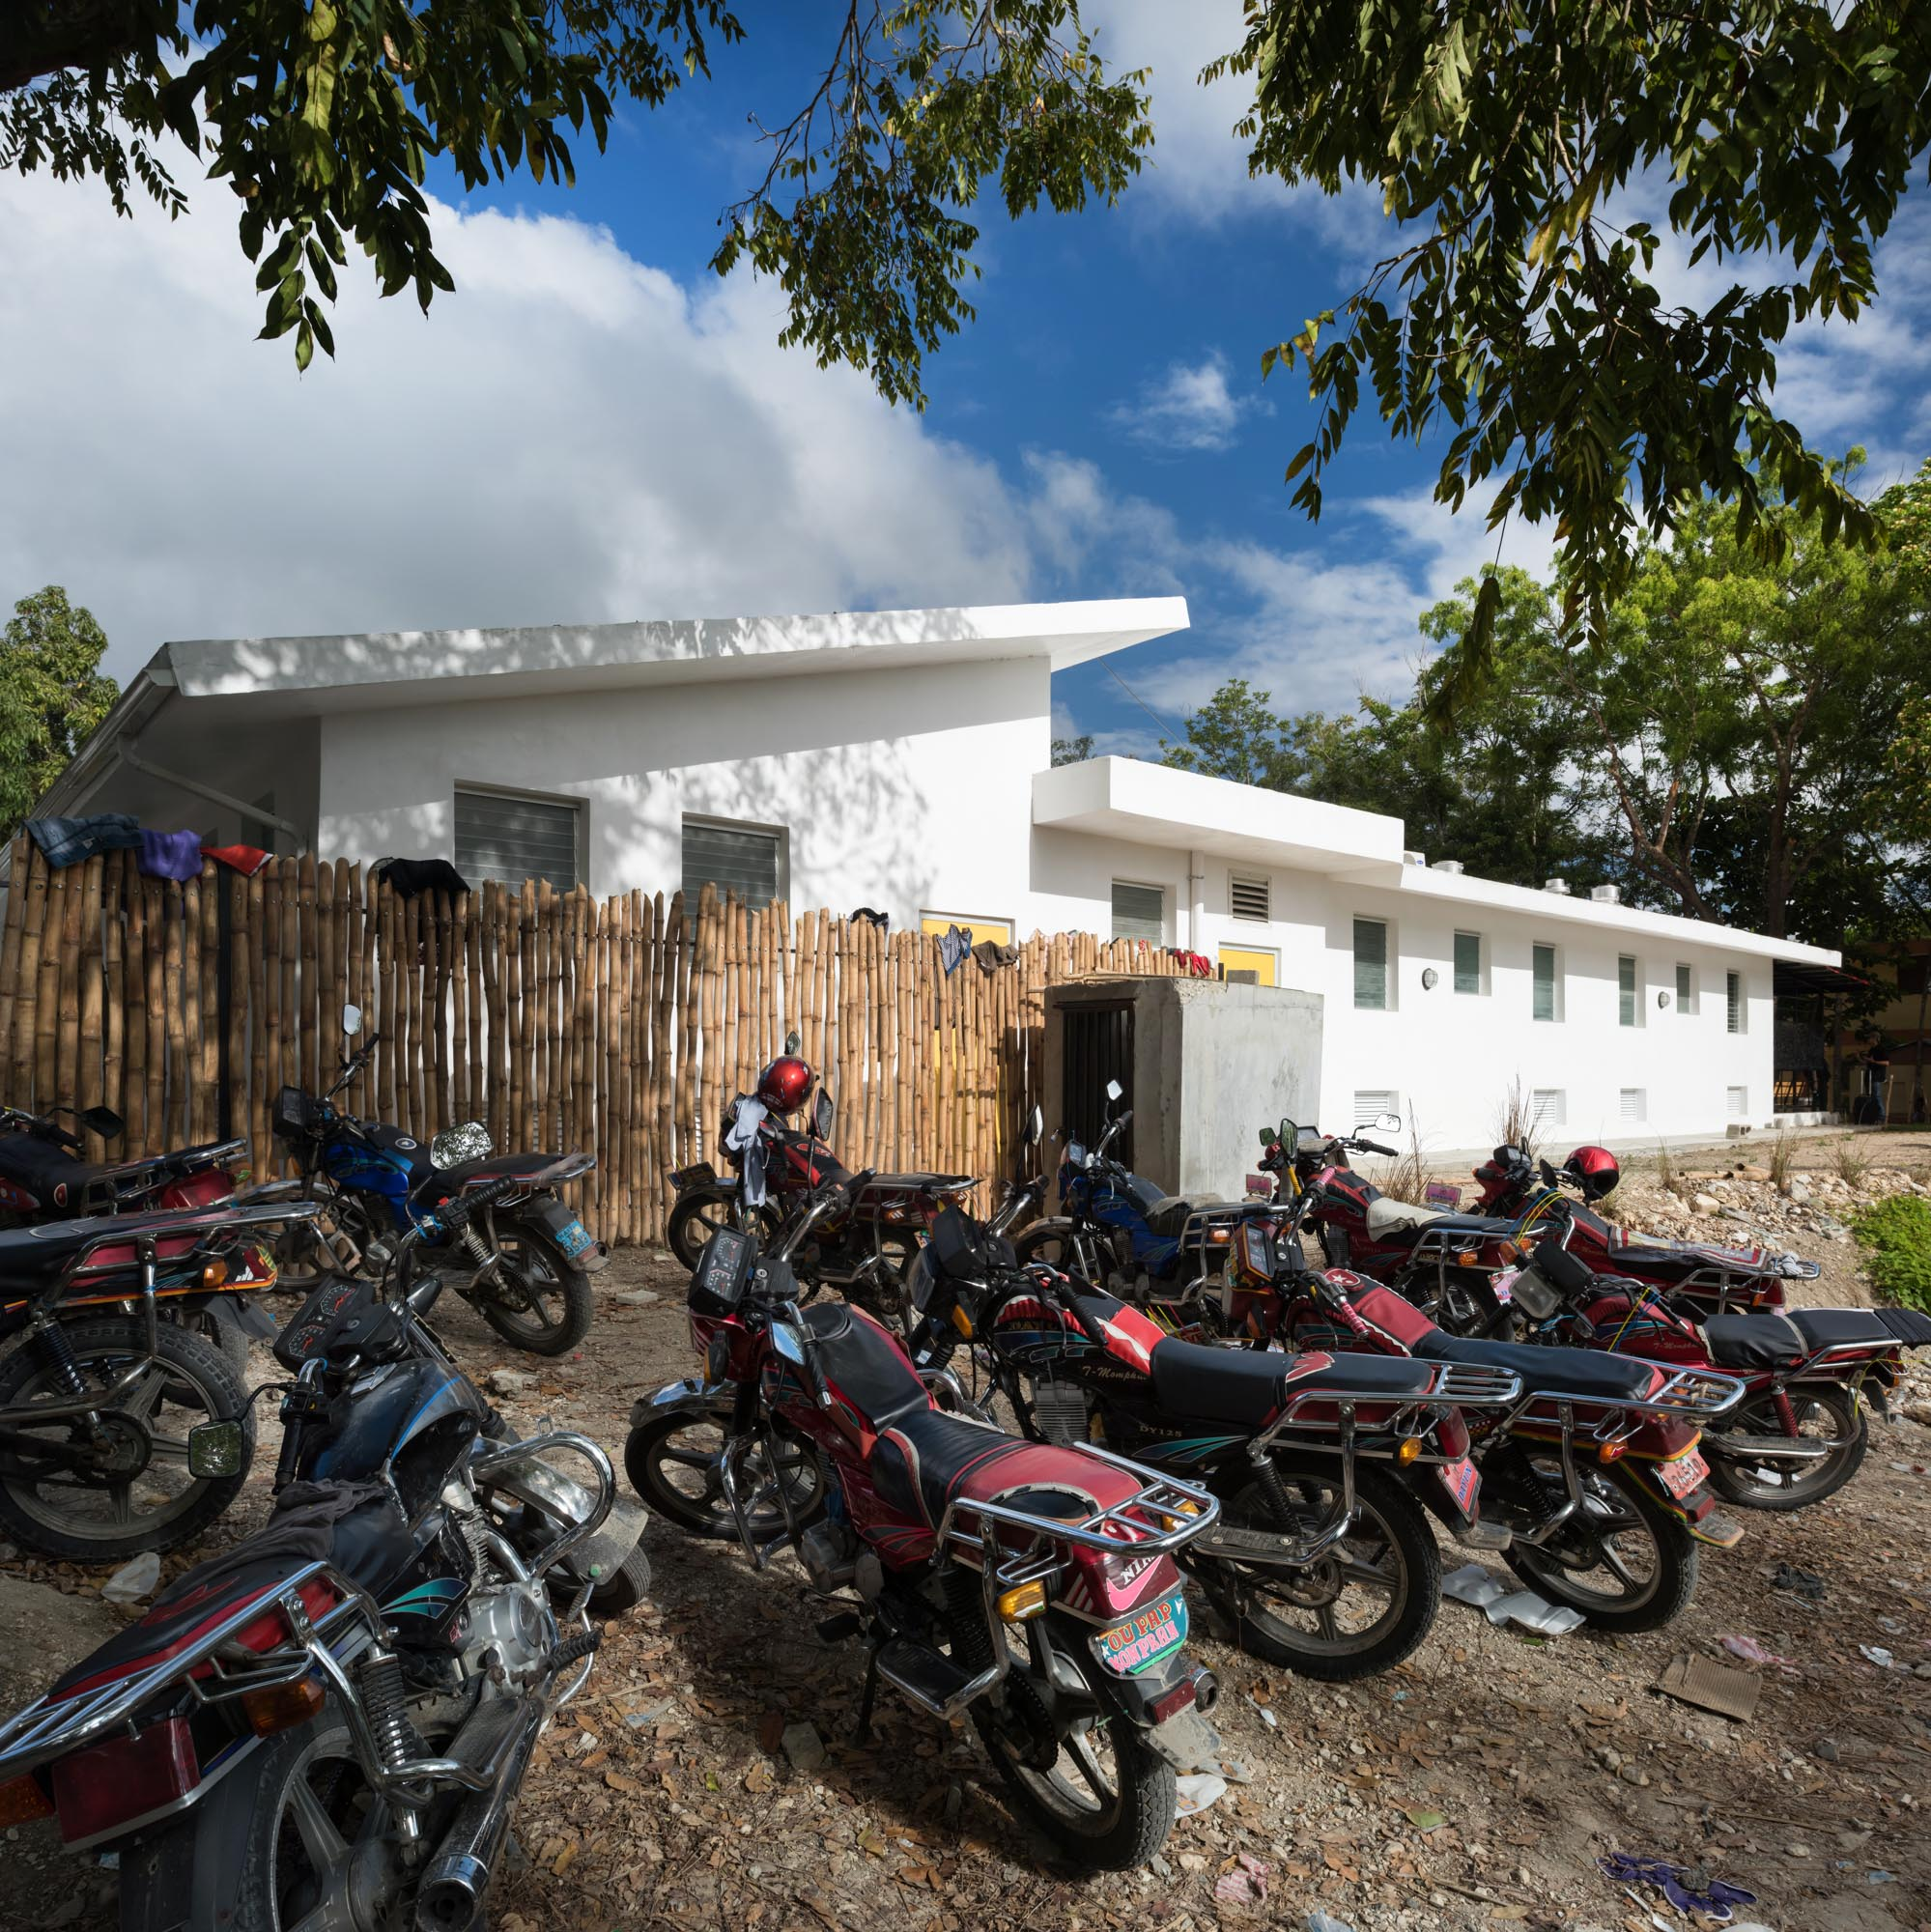 St. Boniface Hospital: Fond-des-Blancs, Haiti